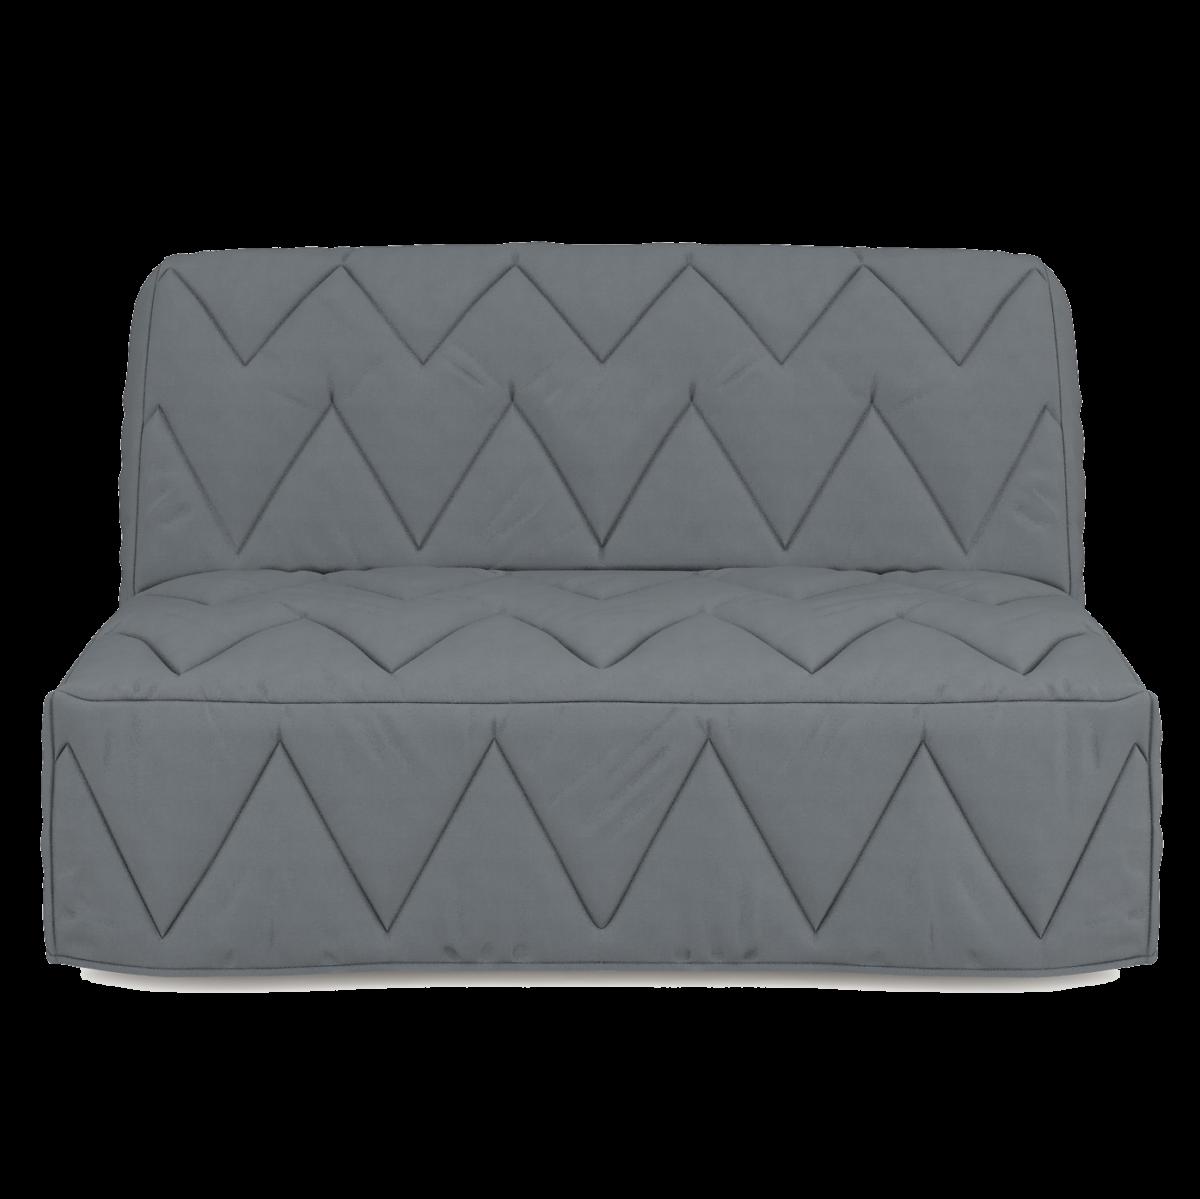 Диван-кровать Вилли (энигма 11)